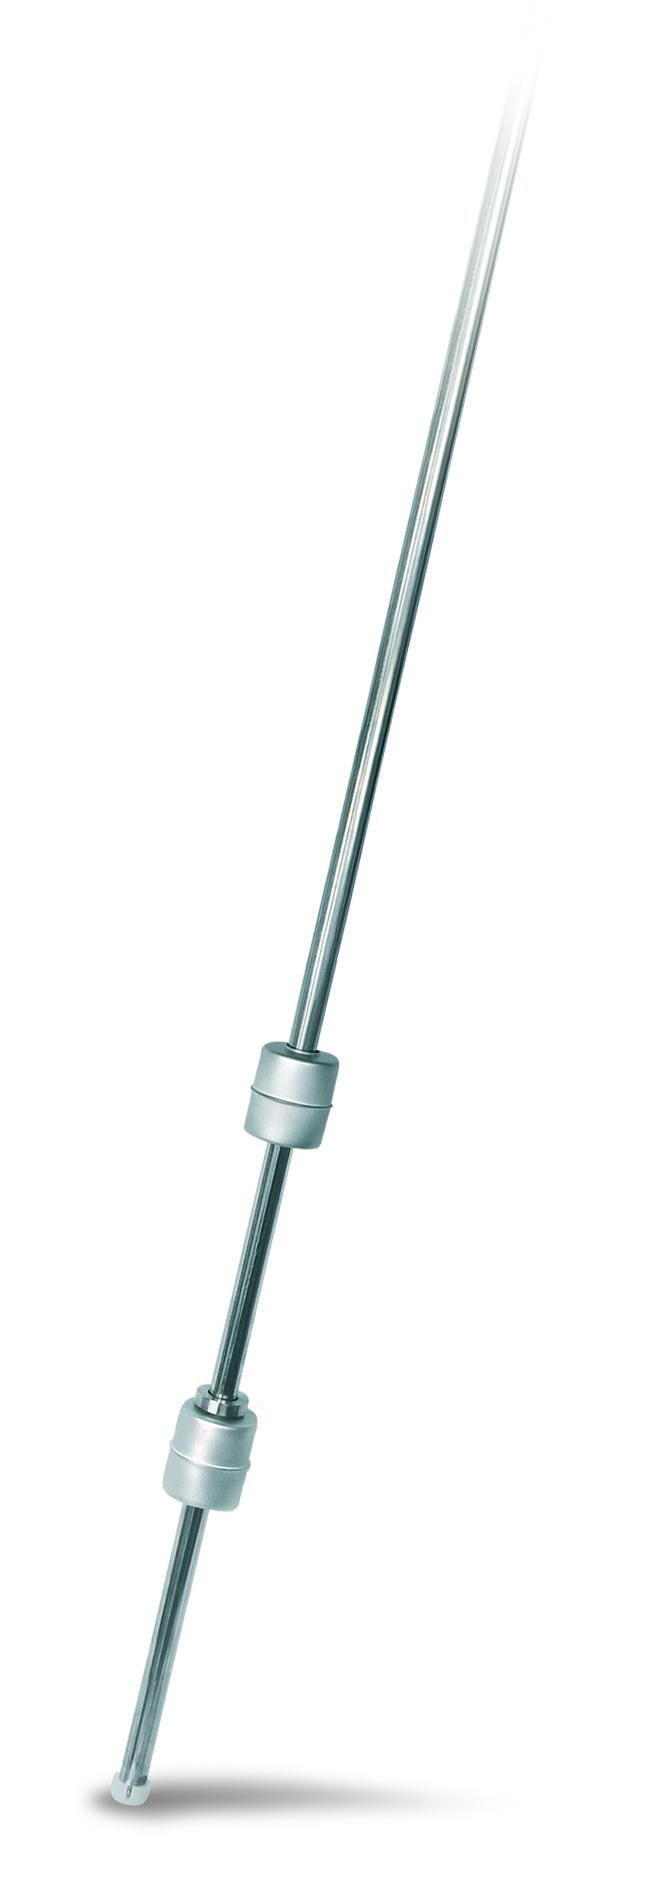 Sonde LabkoMax 7100MR1